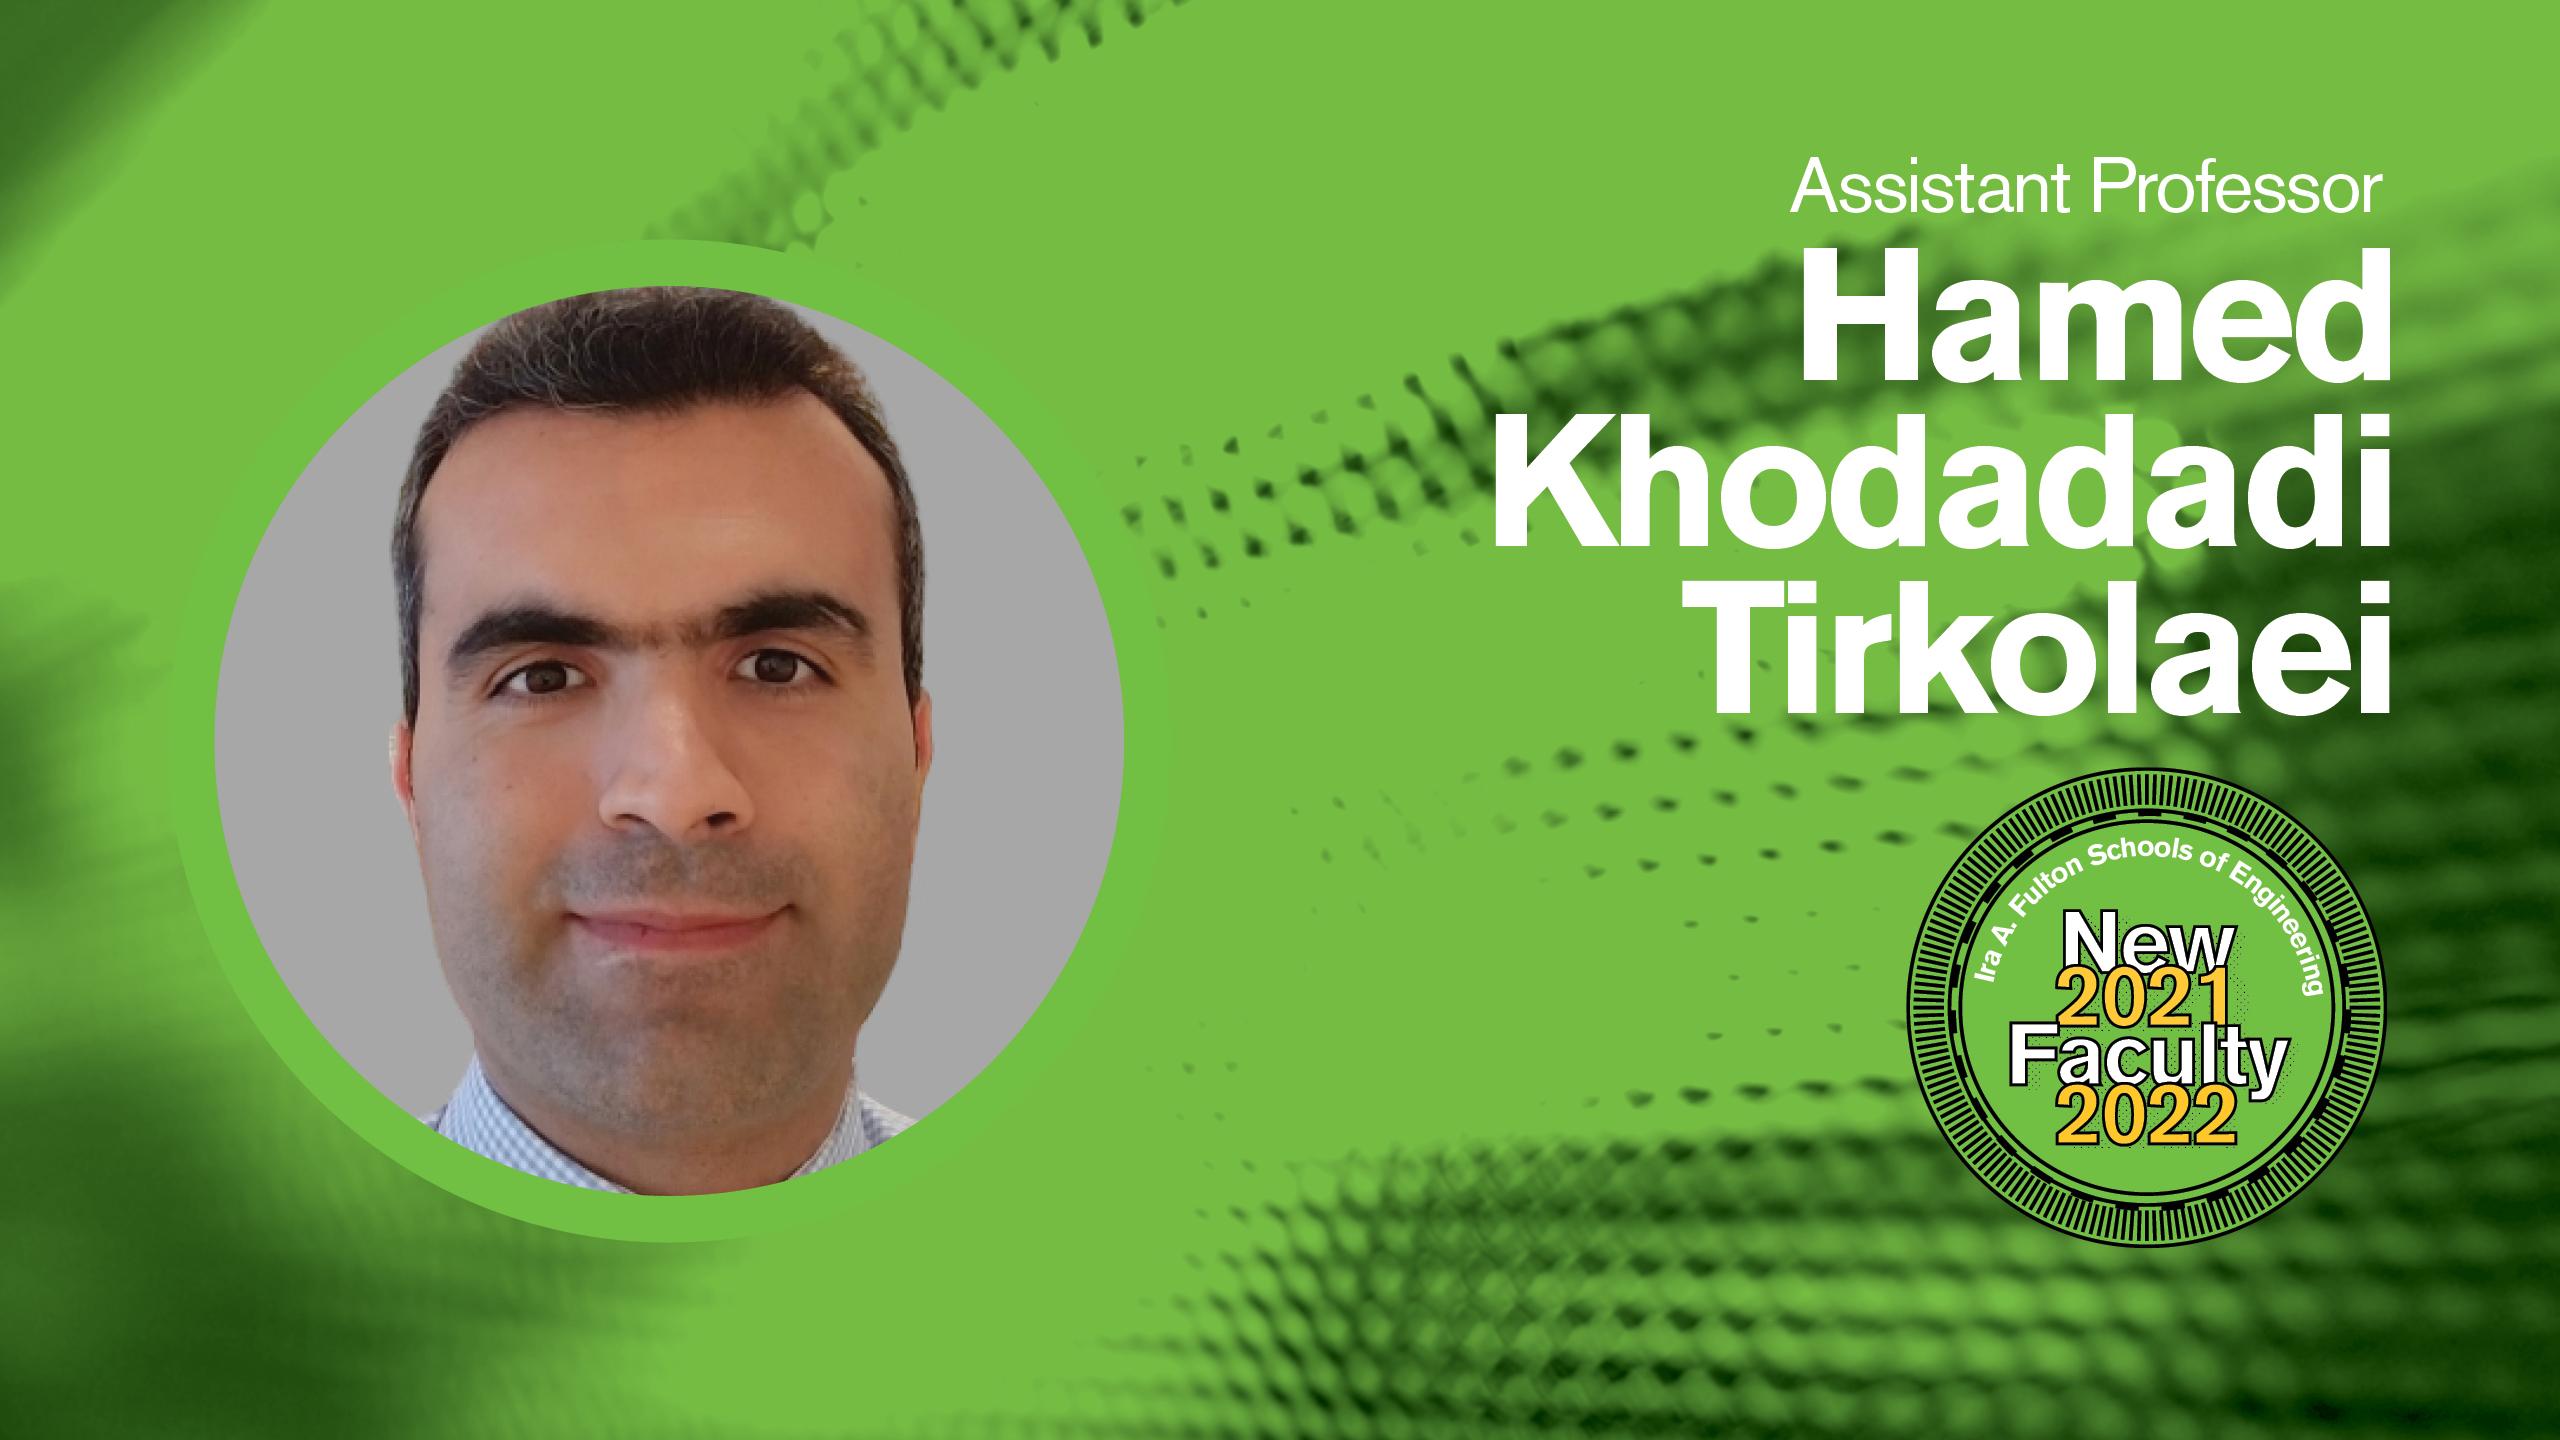 Hamed Khodadadi Tirkolaei